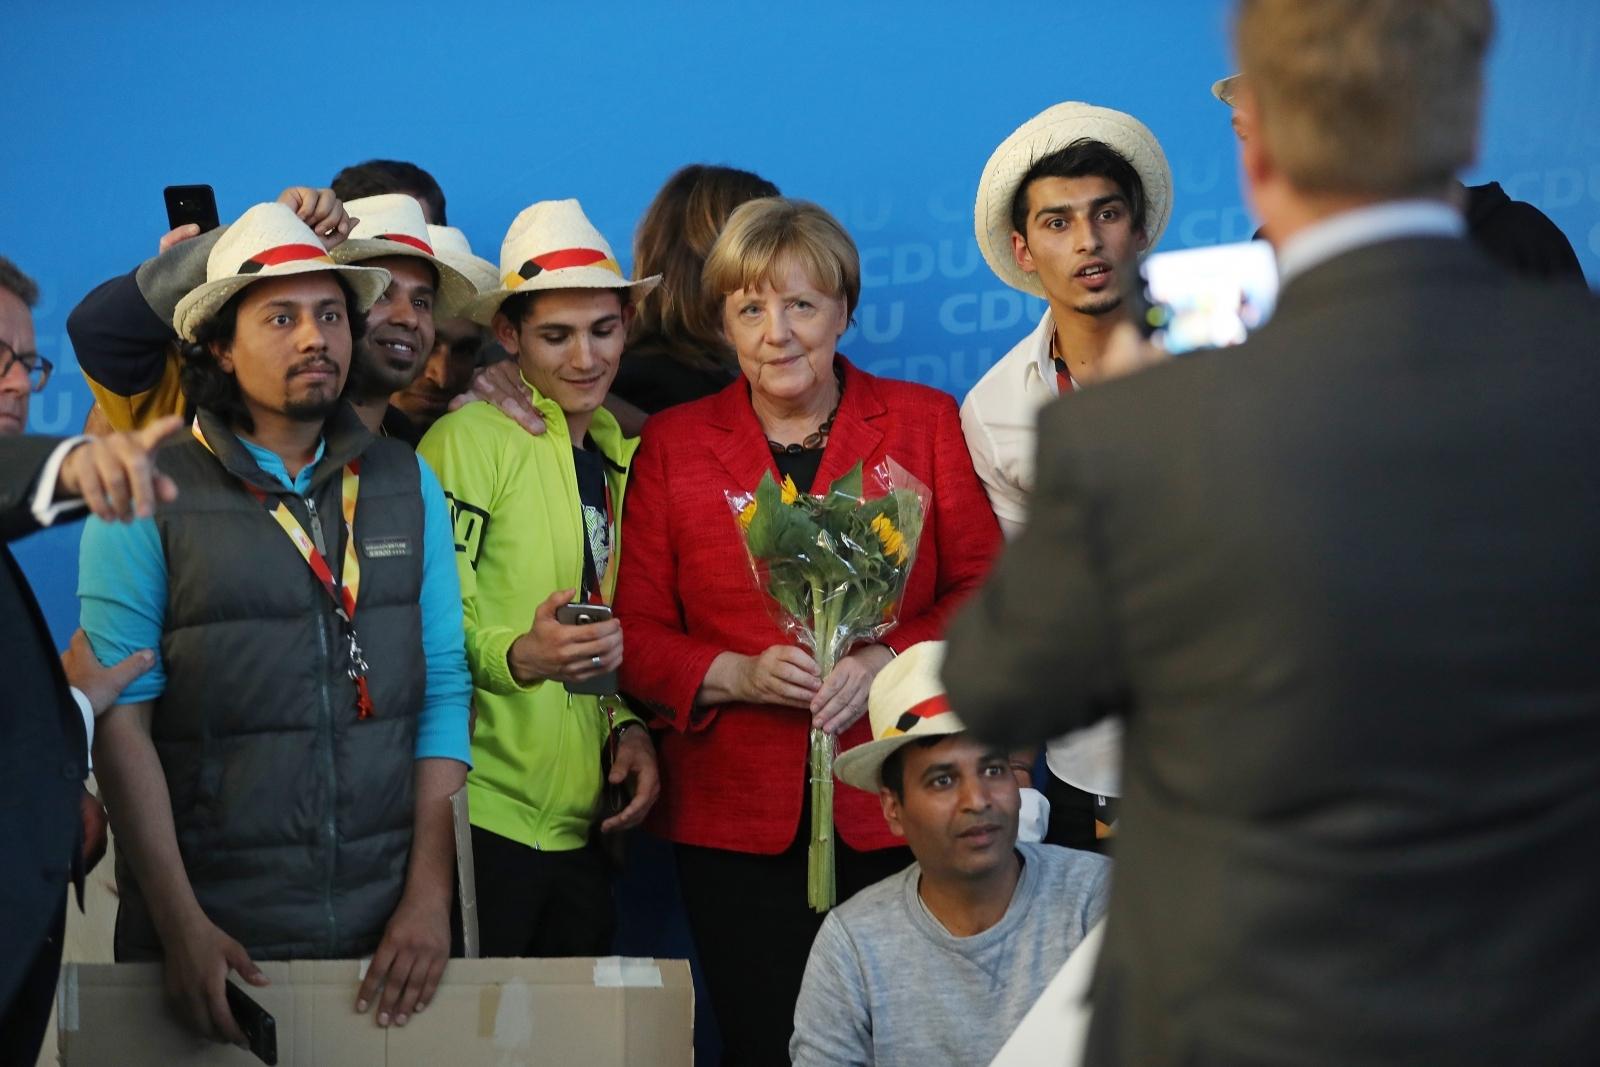 Angela Merkel and Syrian refugees